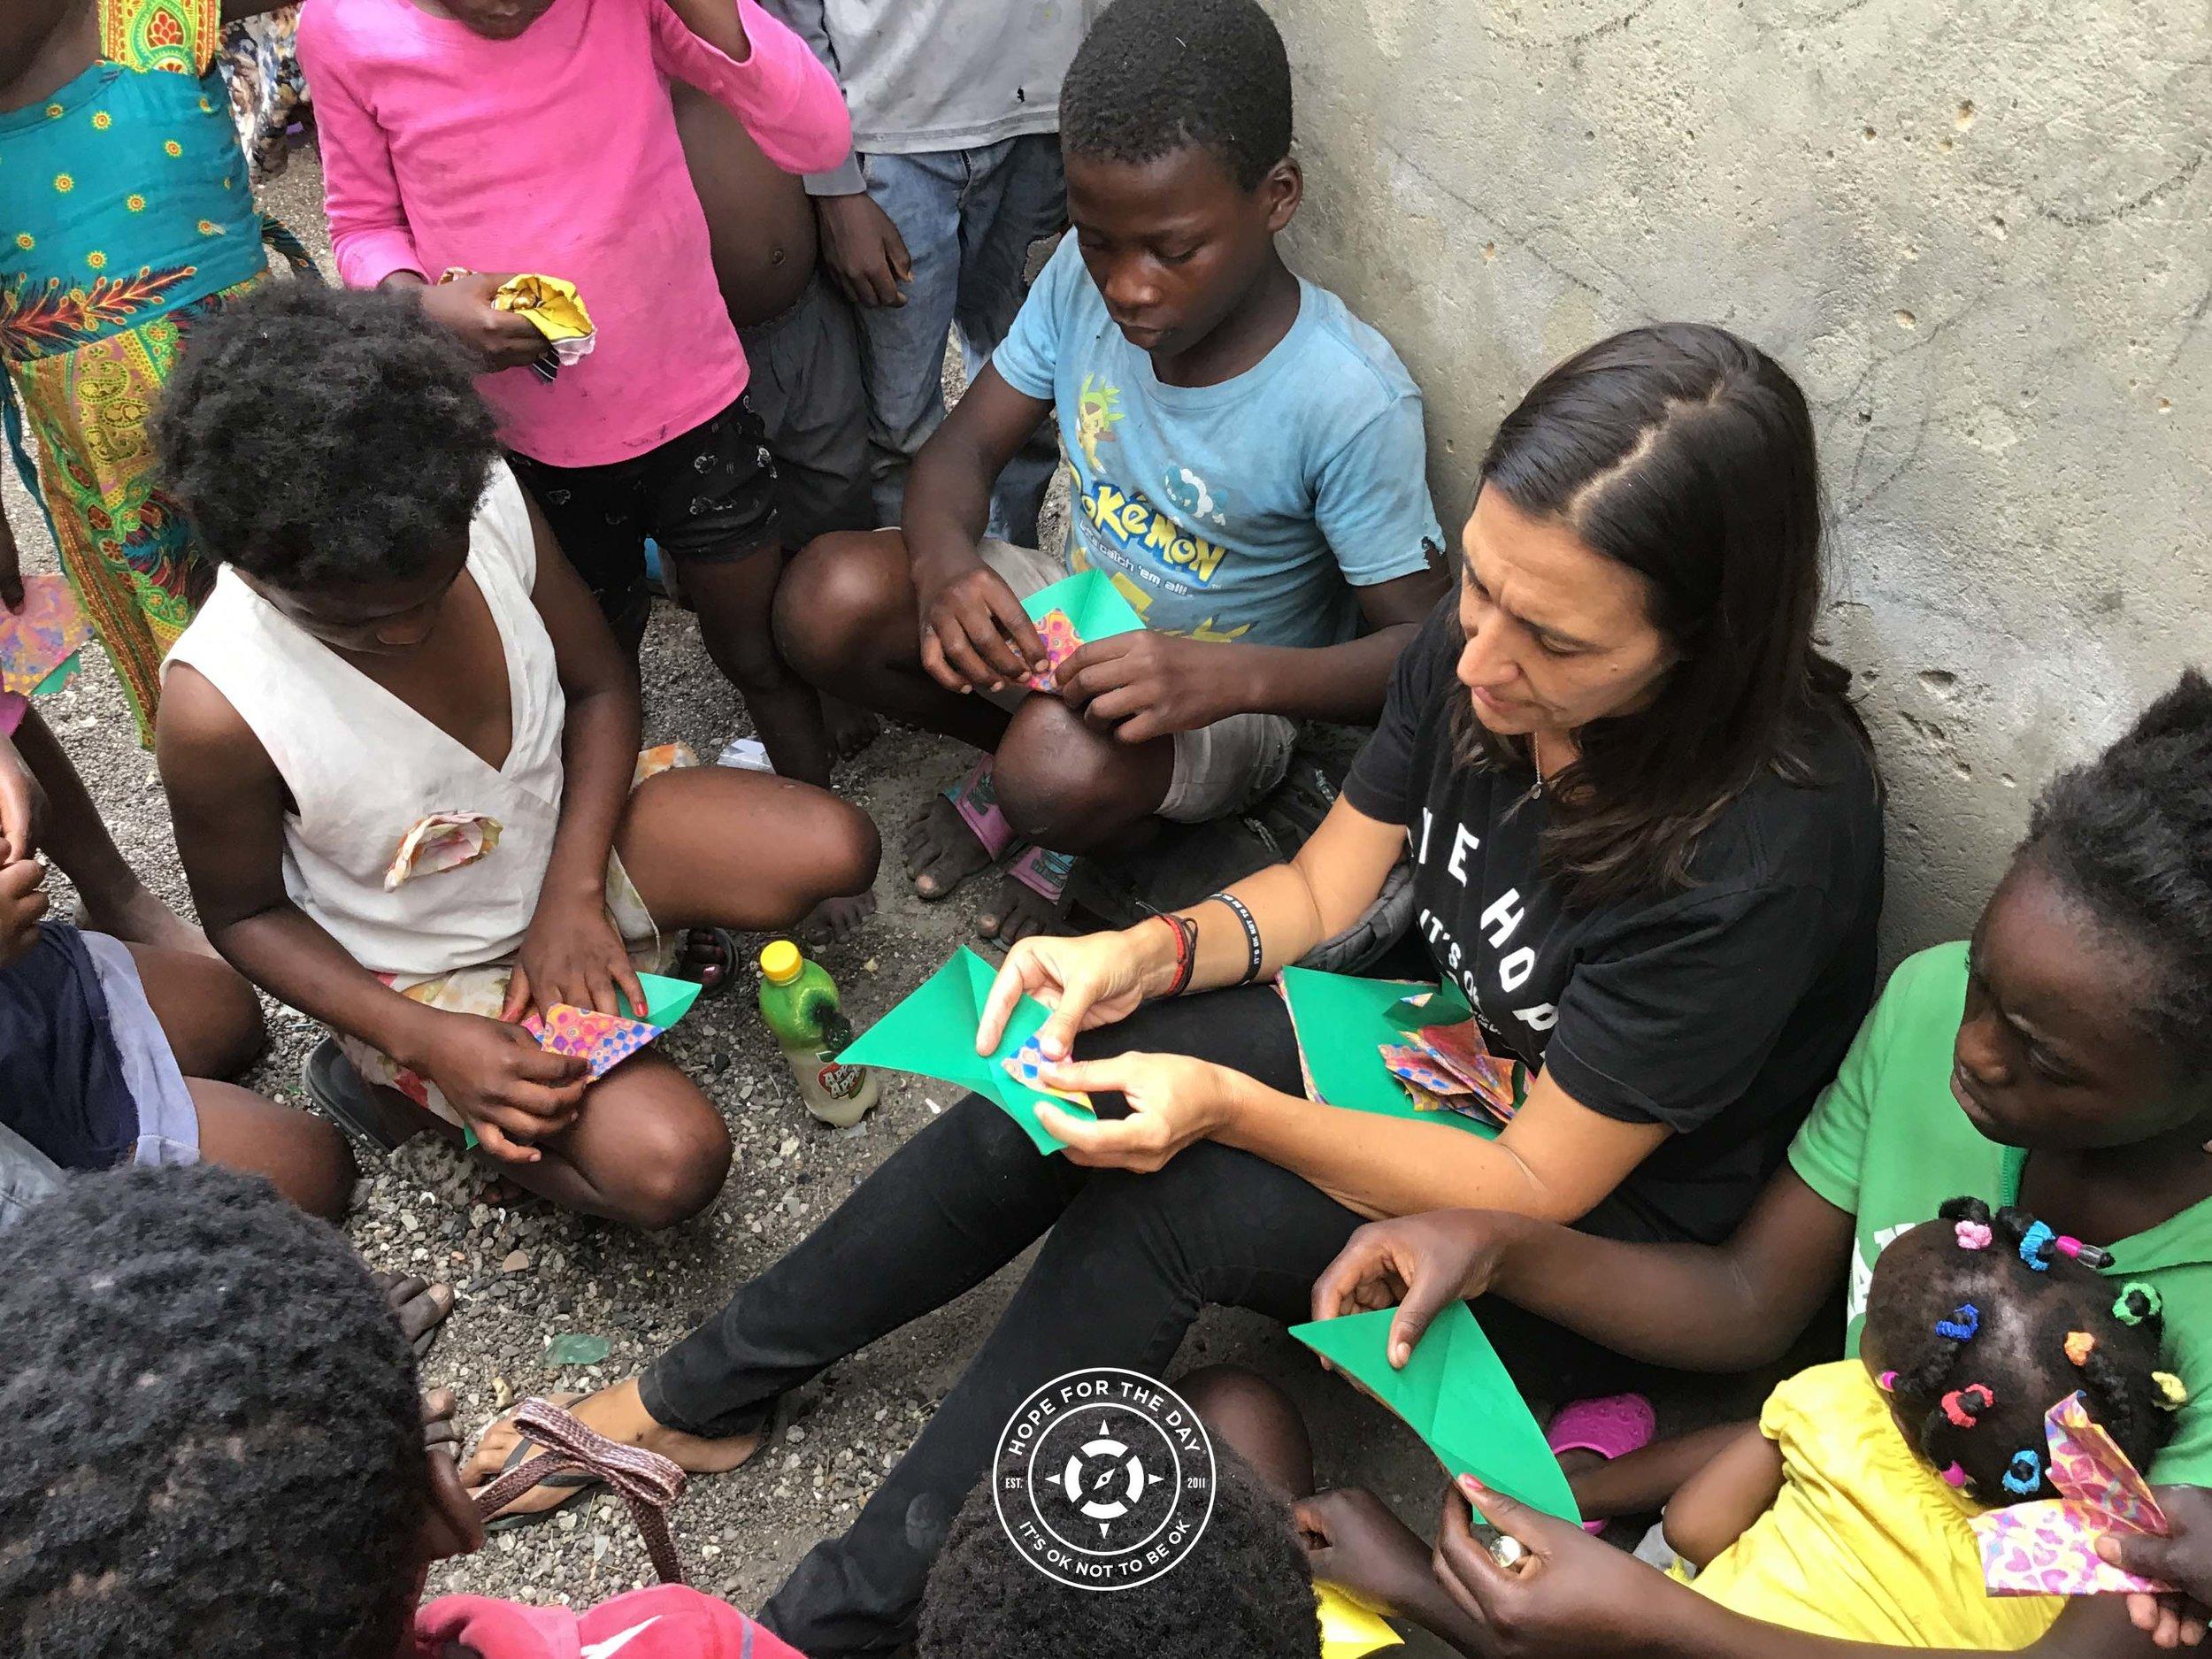 Taking a break from the spray paint to teach origami in Uganda. Credit: Nancy Bartosz